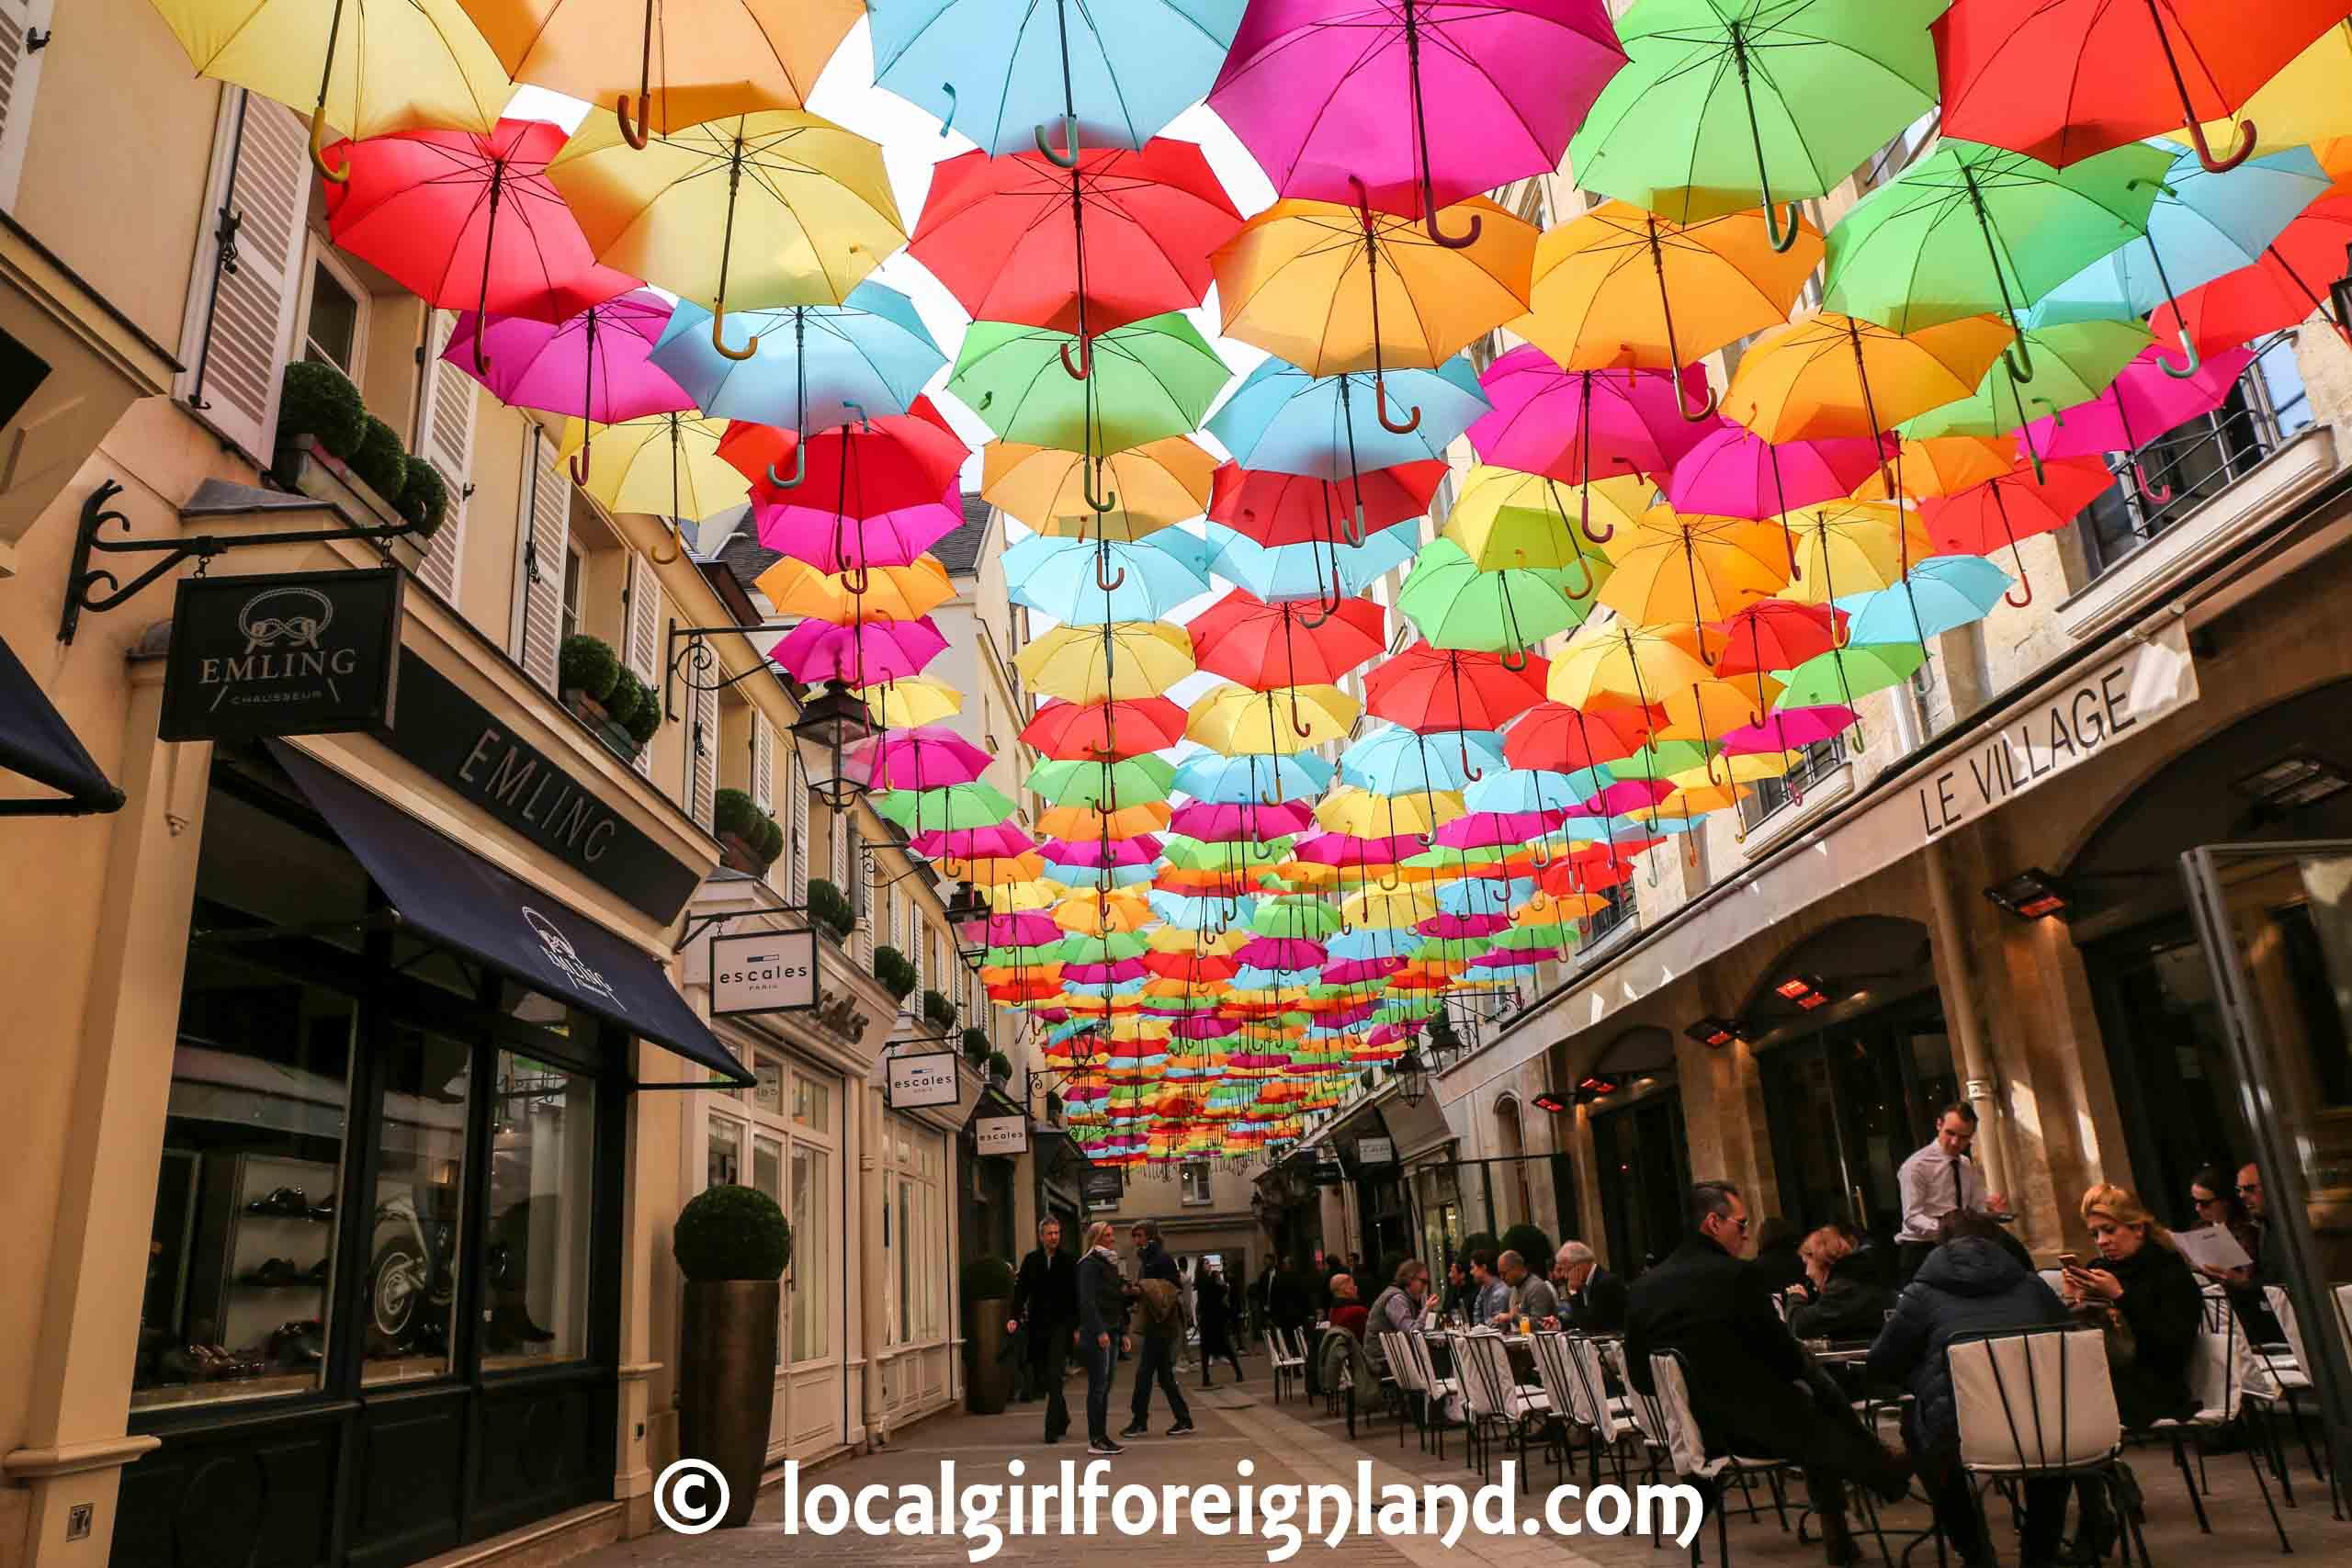 Le Village Royal, Paris Summer, Umbrella sky project